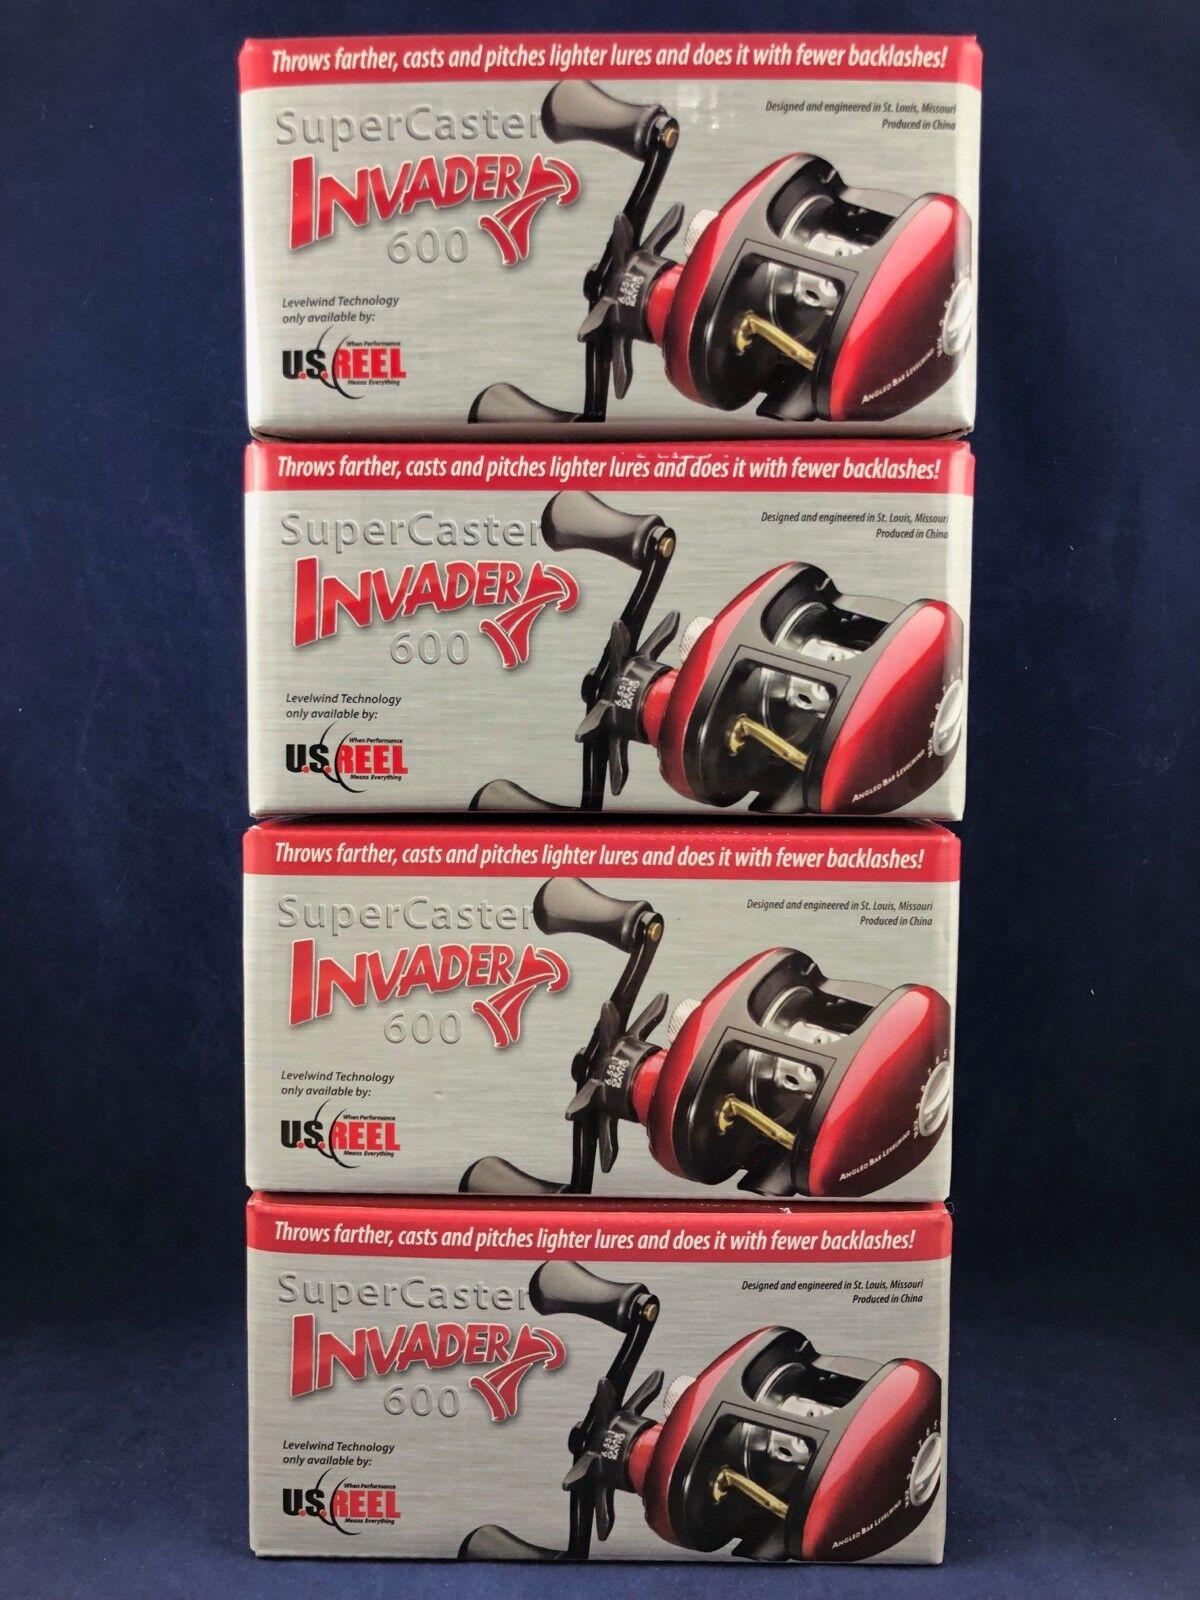 NEW  U.S. Reel - SuperCaster Invader 600 - Bait Casting Reel - Boxed - Lot of 4